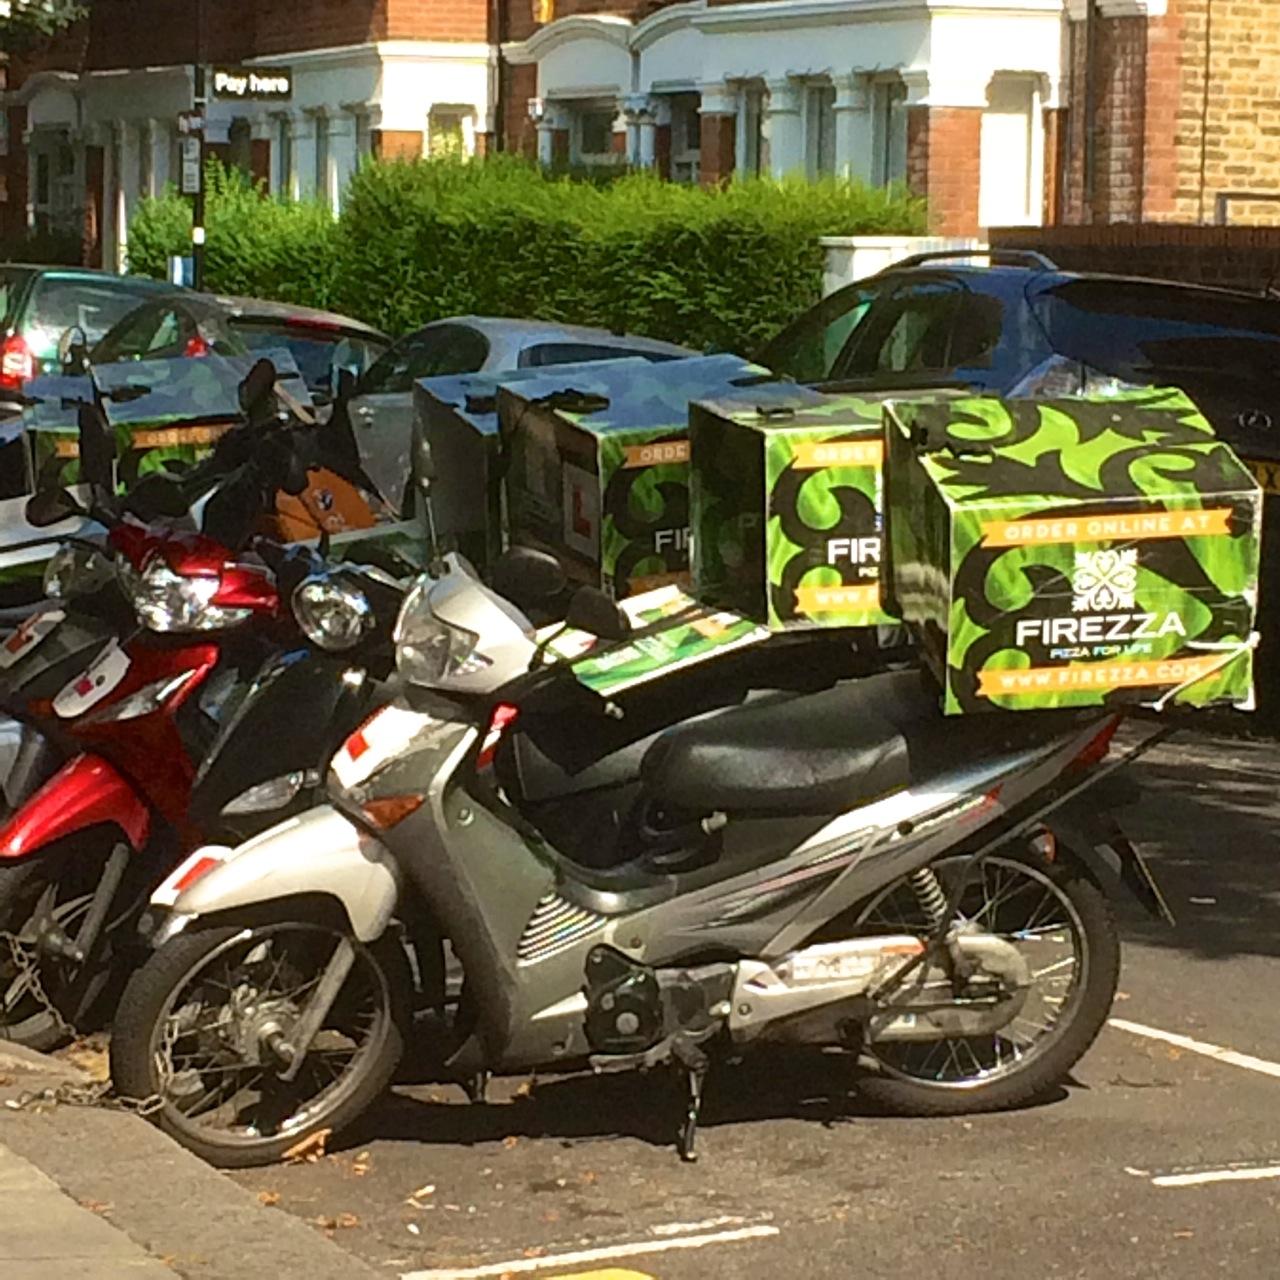 https://i0.wp.com/fatgayvegan.com/wp-content/uploads/2015/09/Delivery-motorcycles.jpg?fit=1280%2C1280